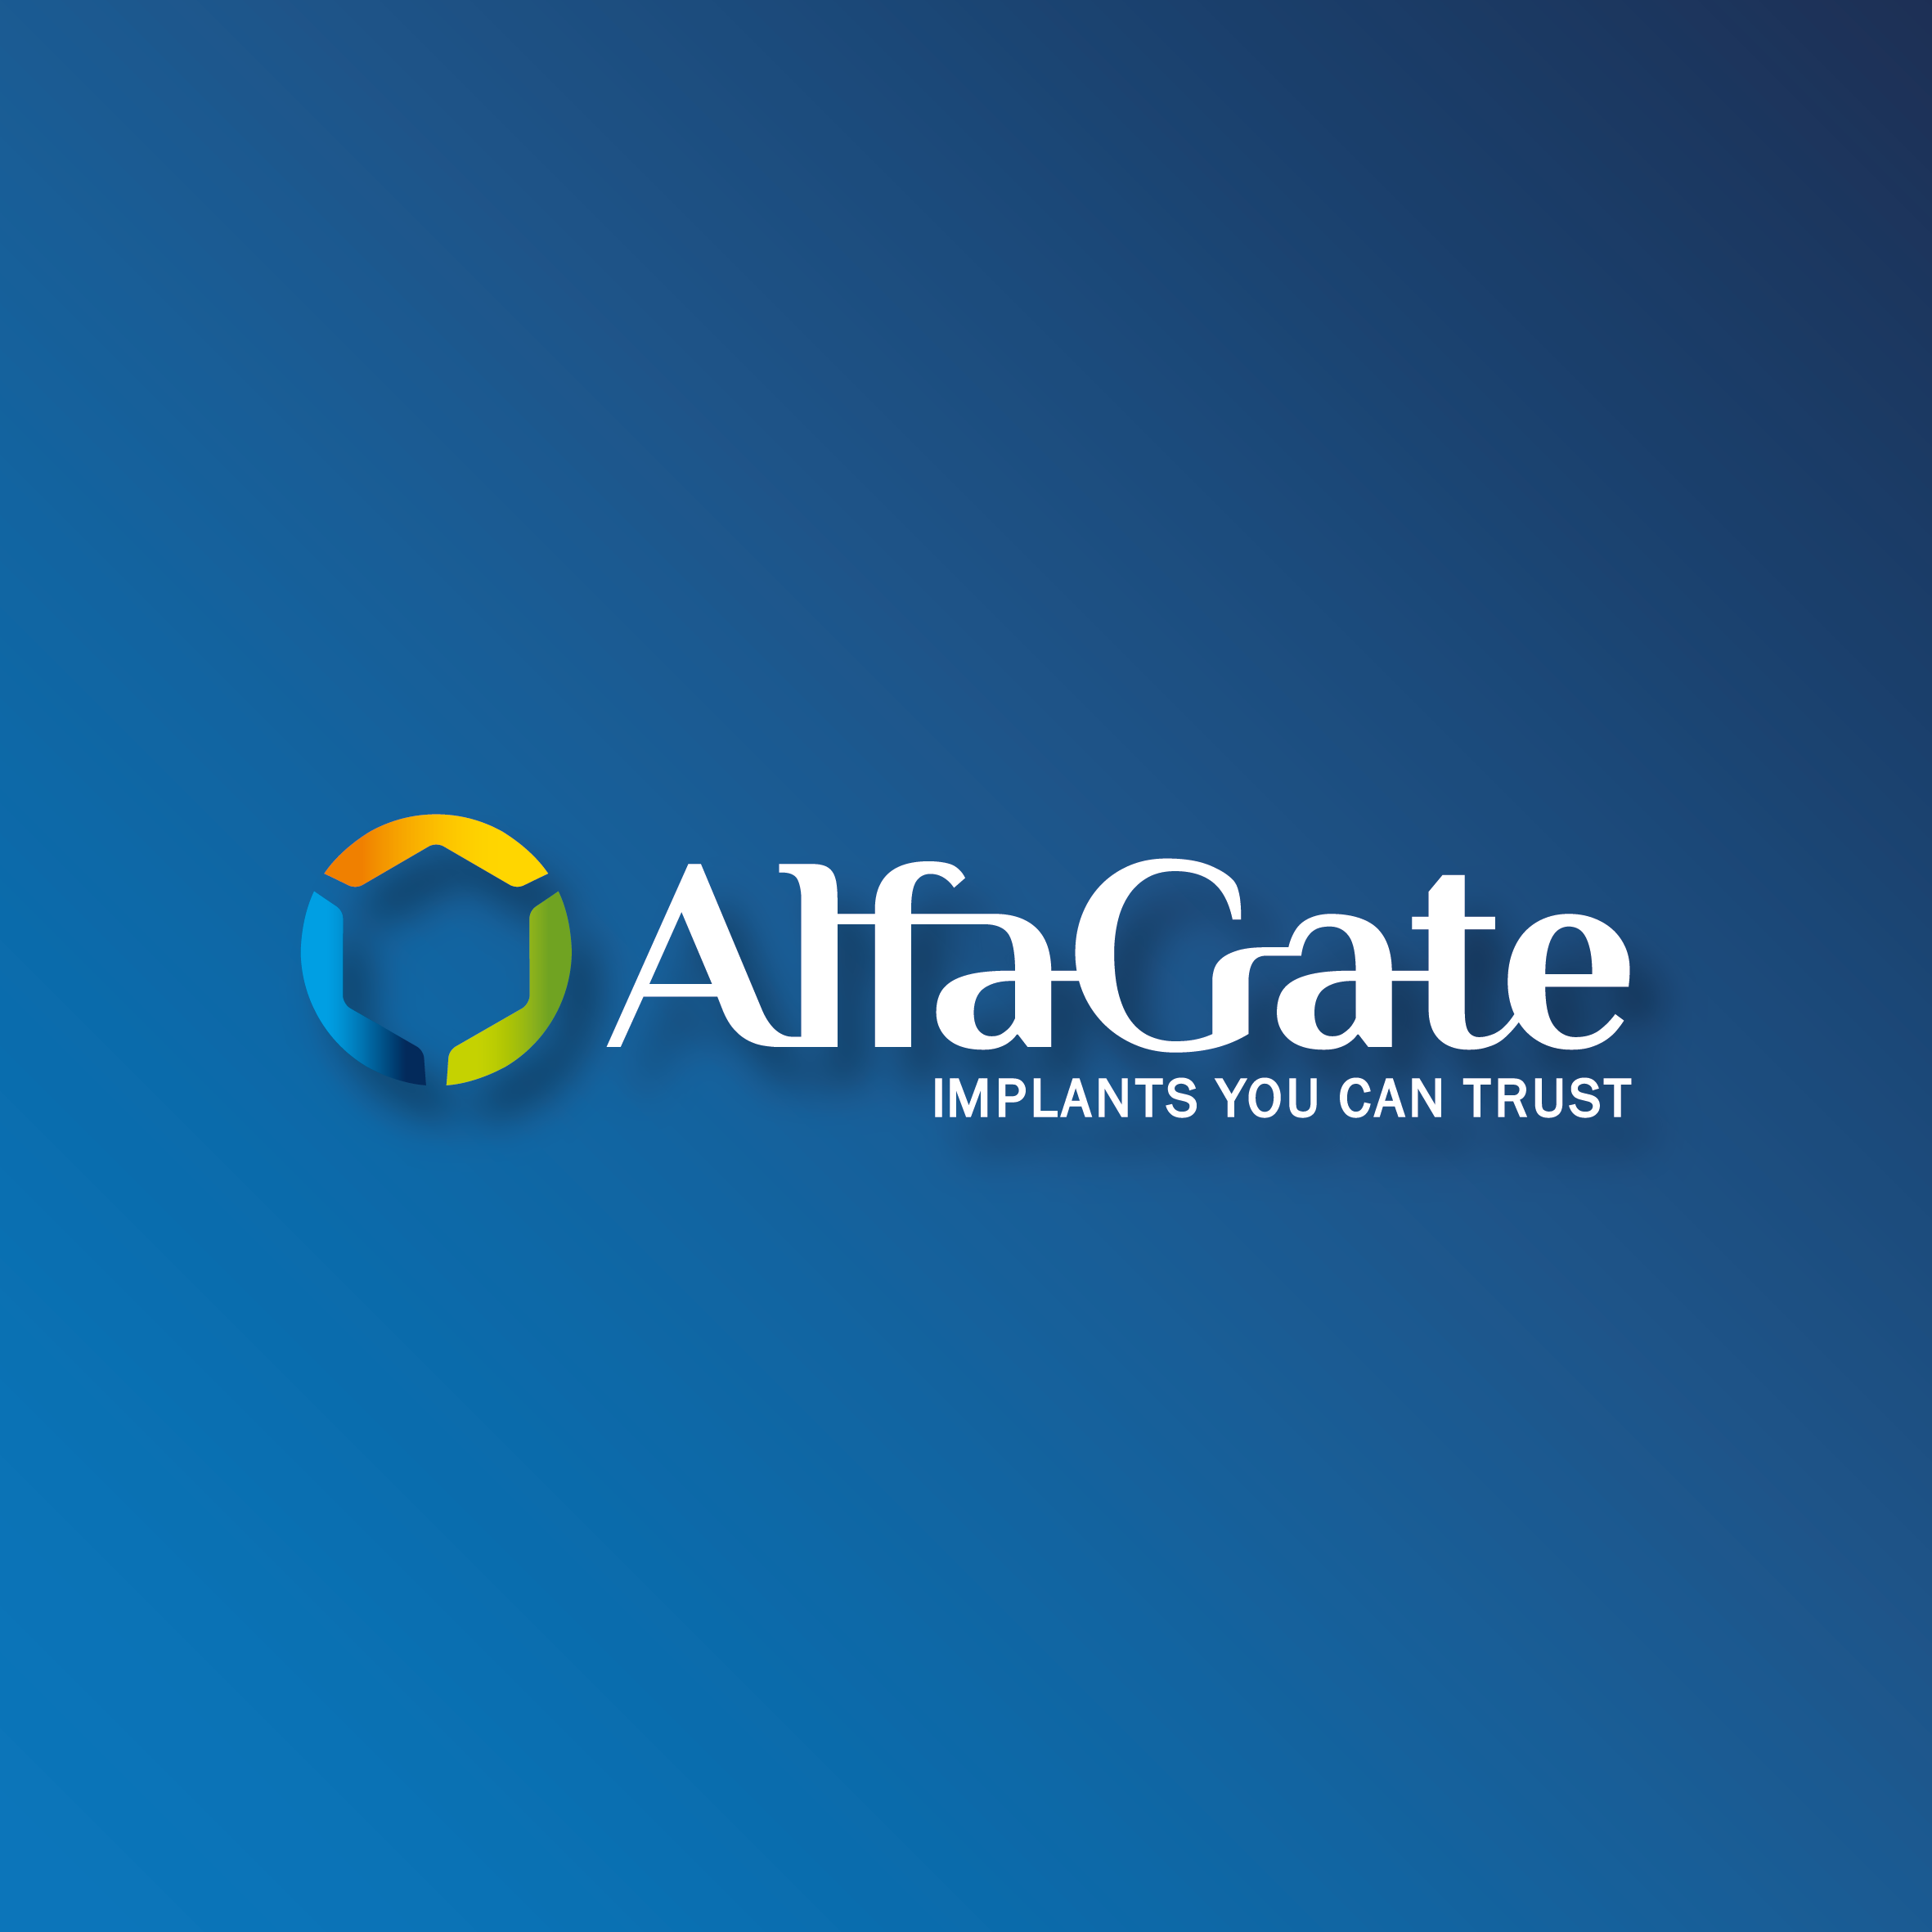 Alfa Gate Dental Implants